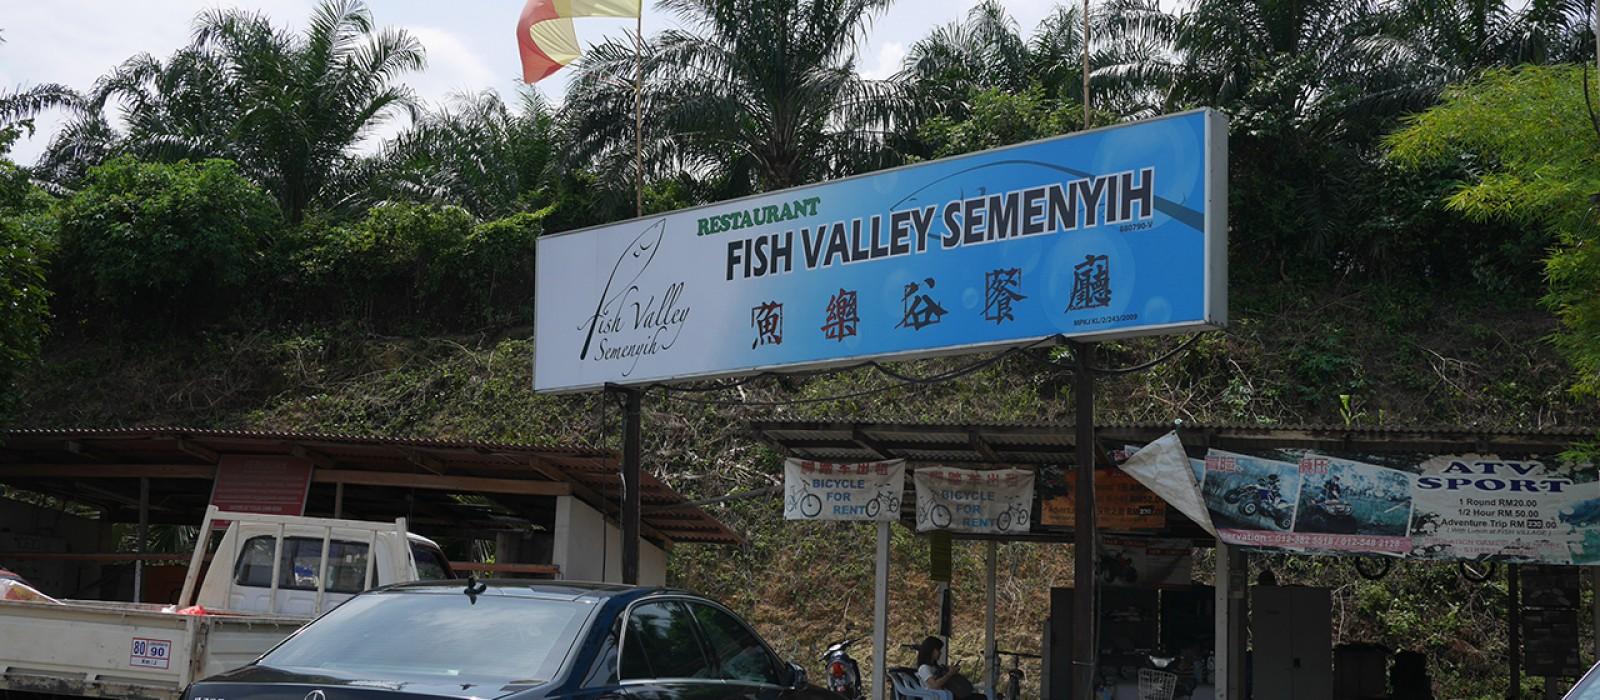 Fish Valley Semenyih